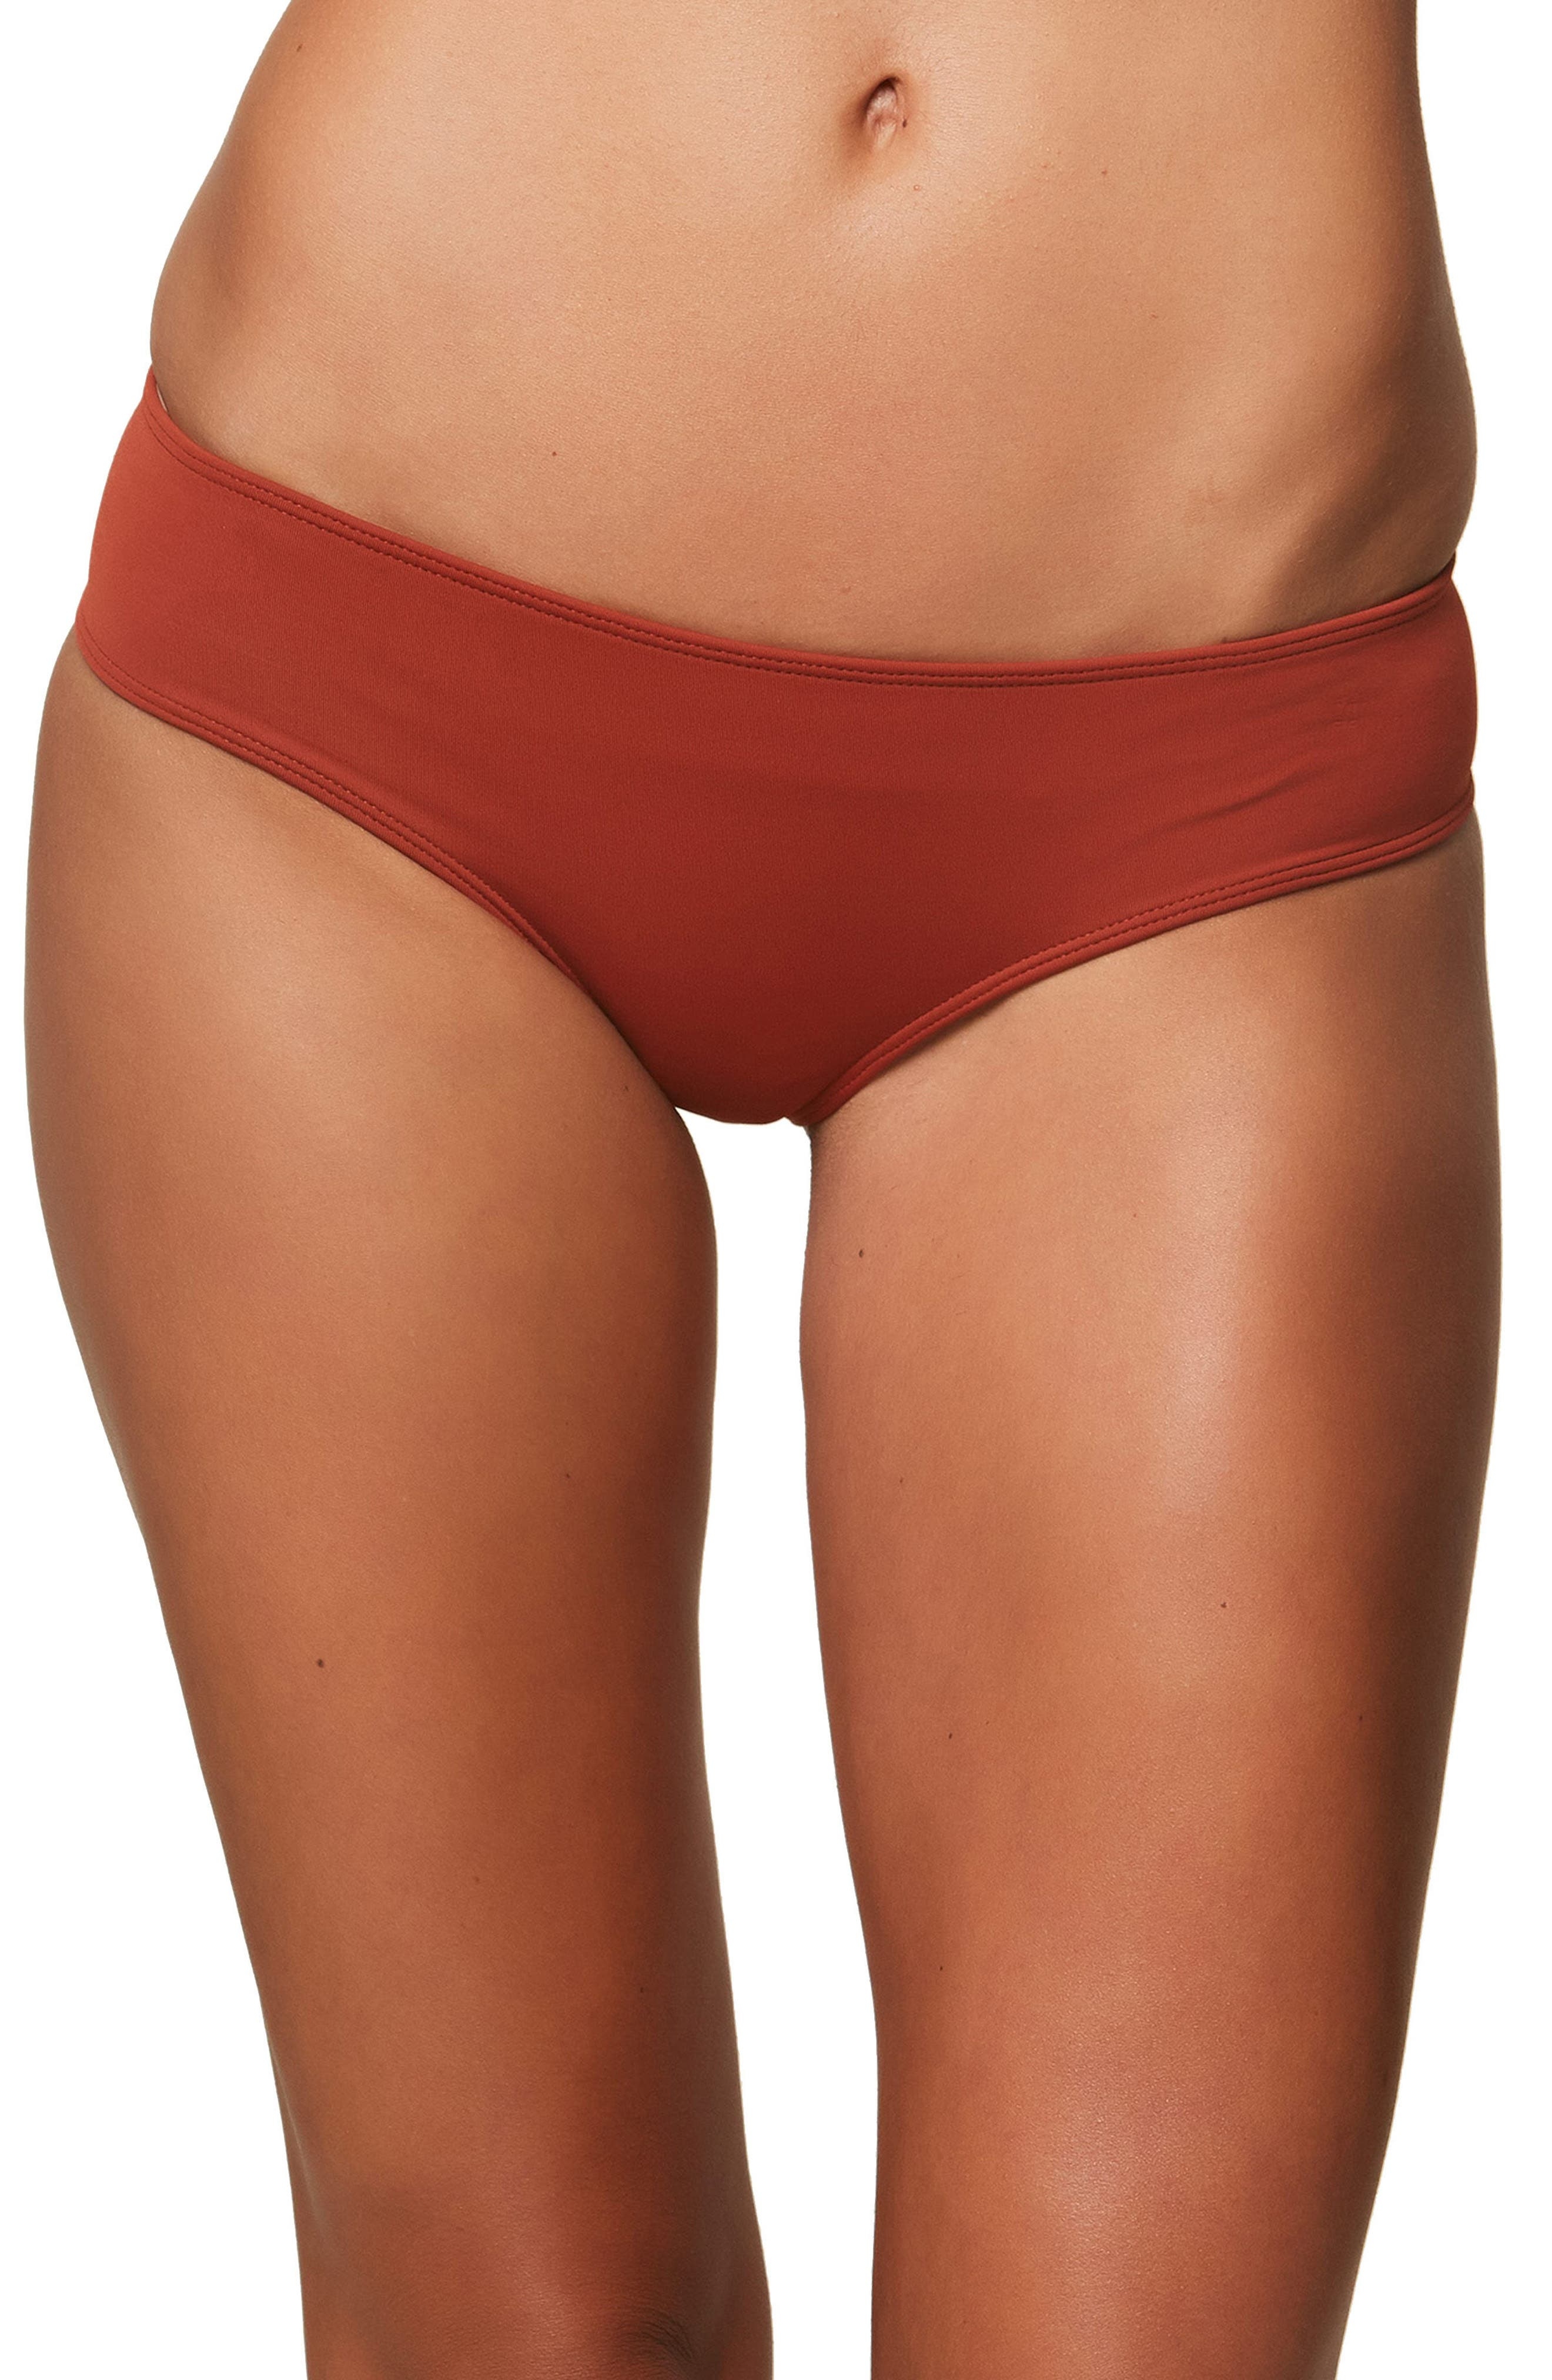 Alternate Image 1 Selected - O'Neill Salt Water Solids Hipster Bikini Bottoms